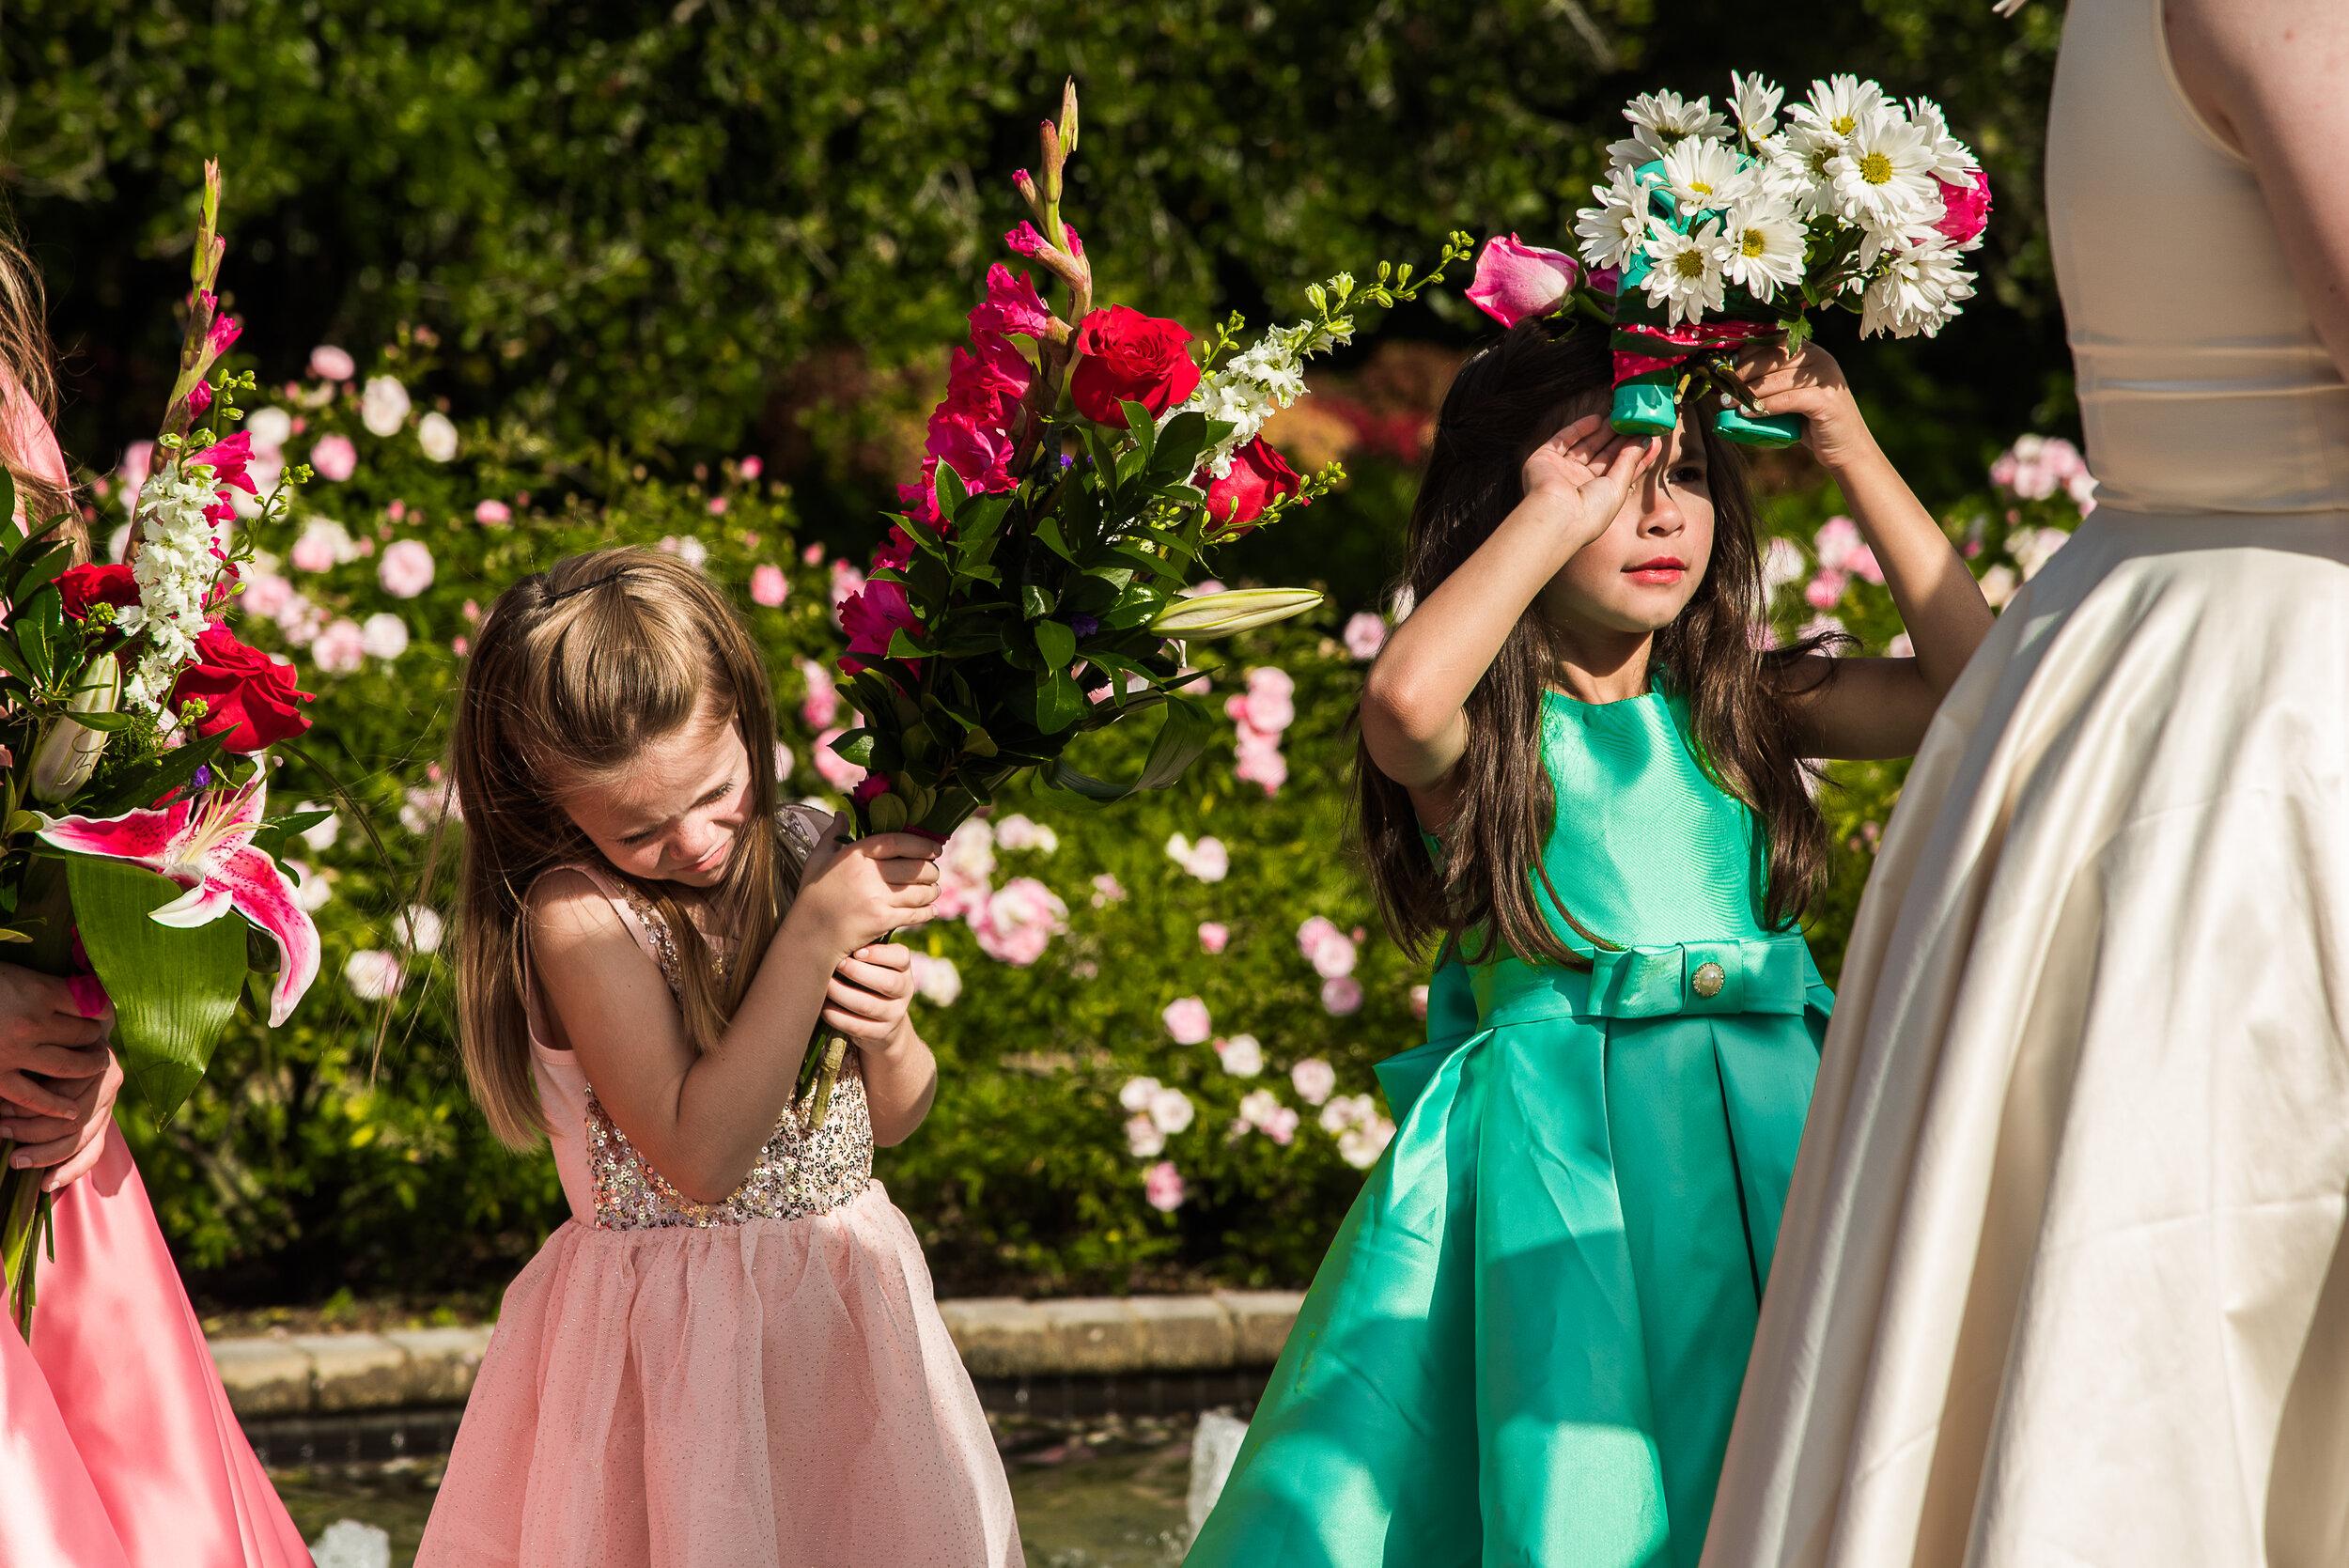 herry-garden-wedding-1-52.jpg